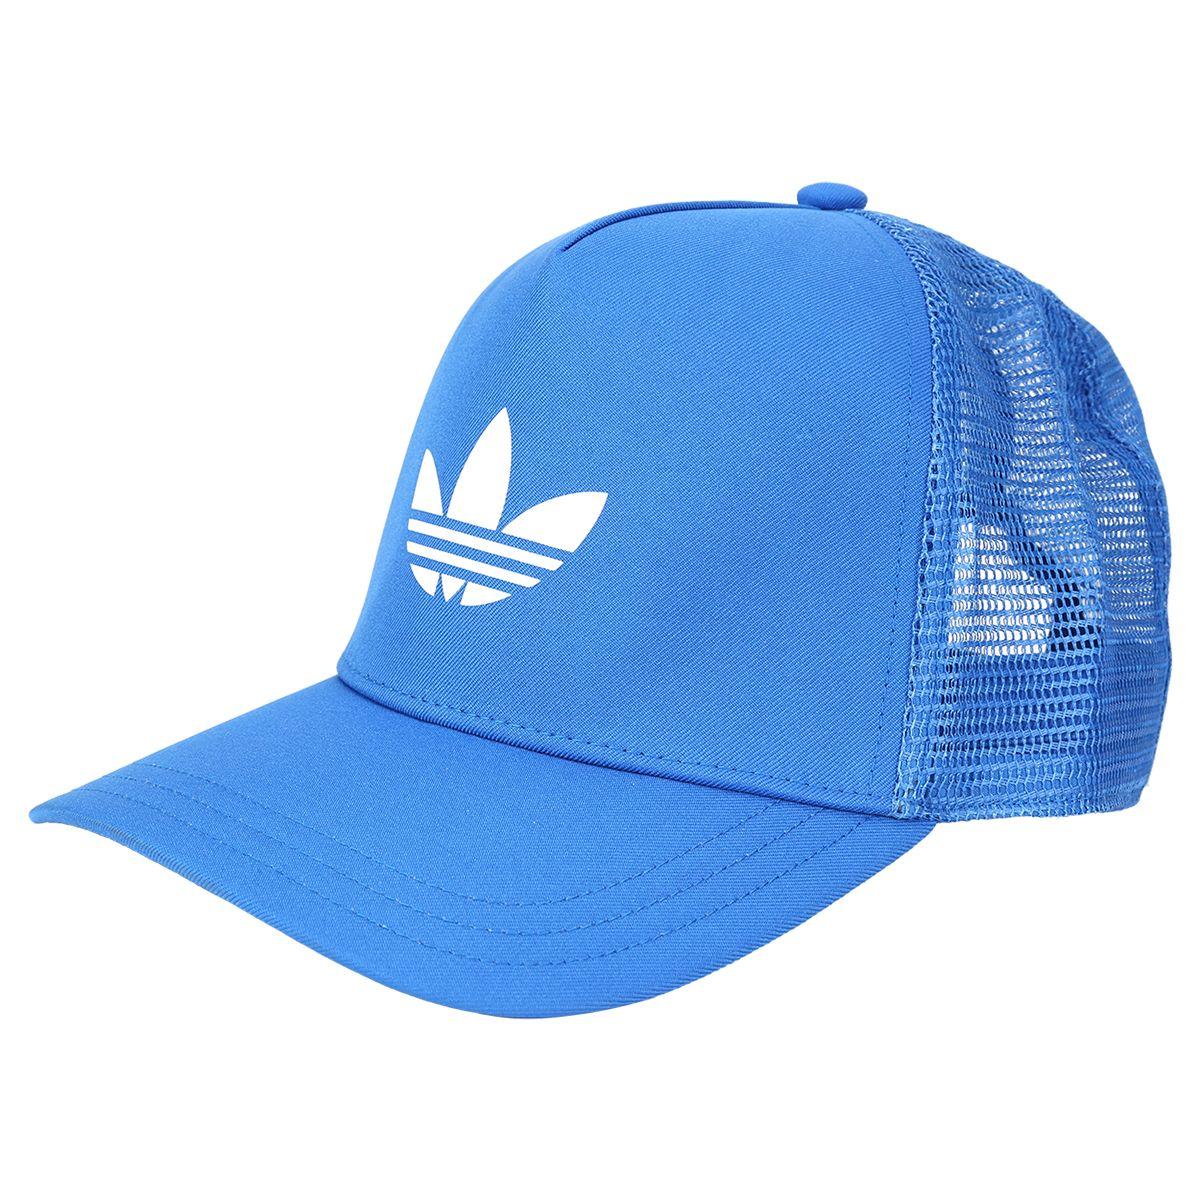 Boné Adidas Trefoil Trucker Azul claro e Branco  66f151bf398